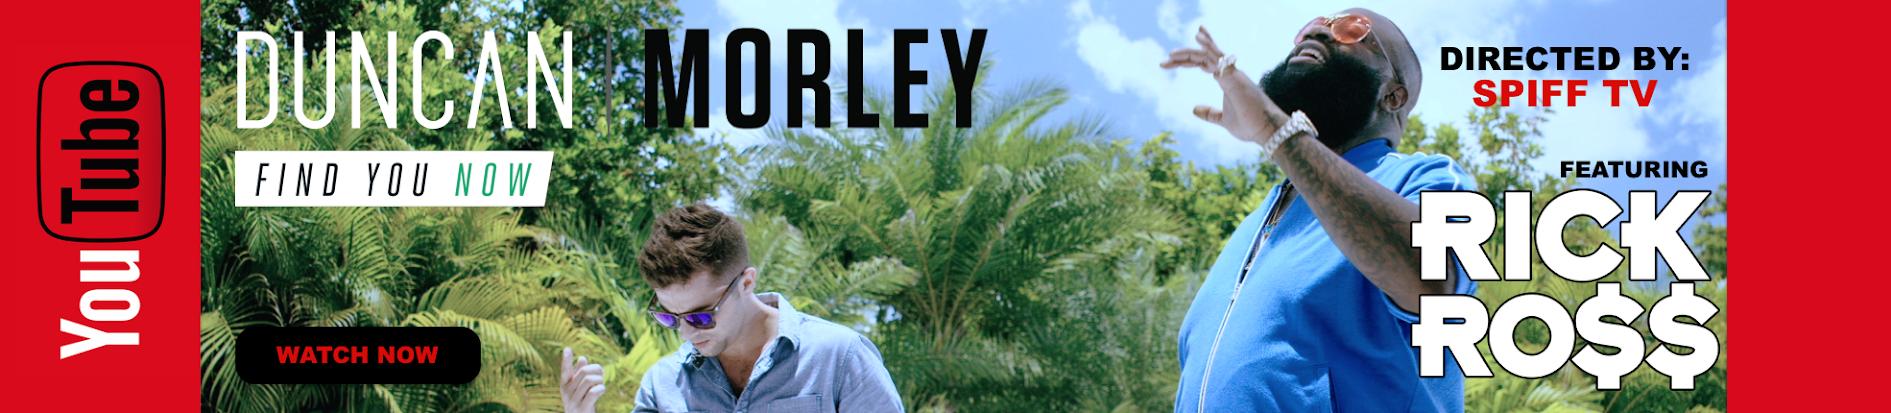 Duncan Morley Rick Ross Youtube Banner.png